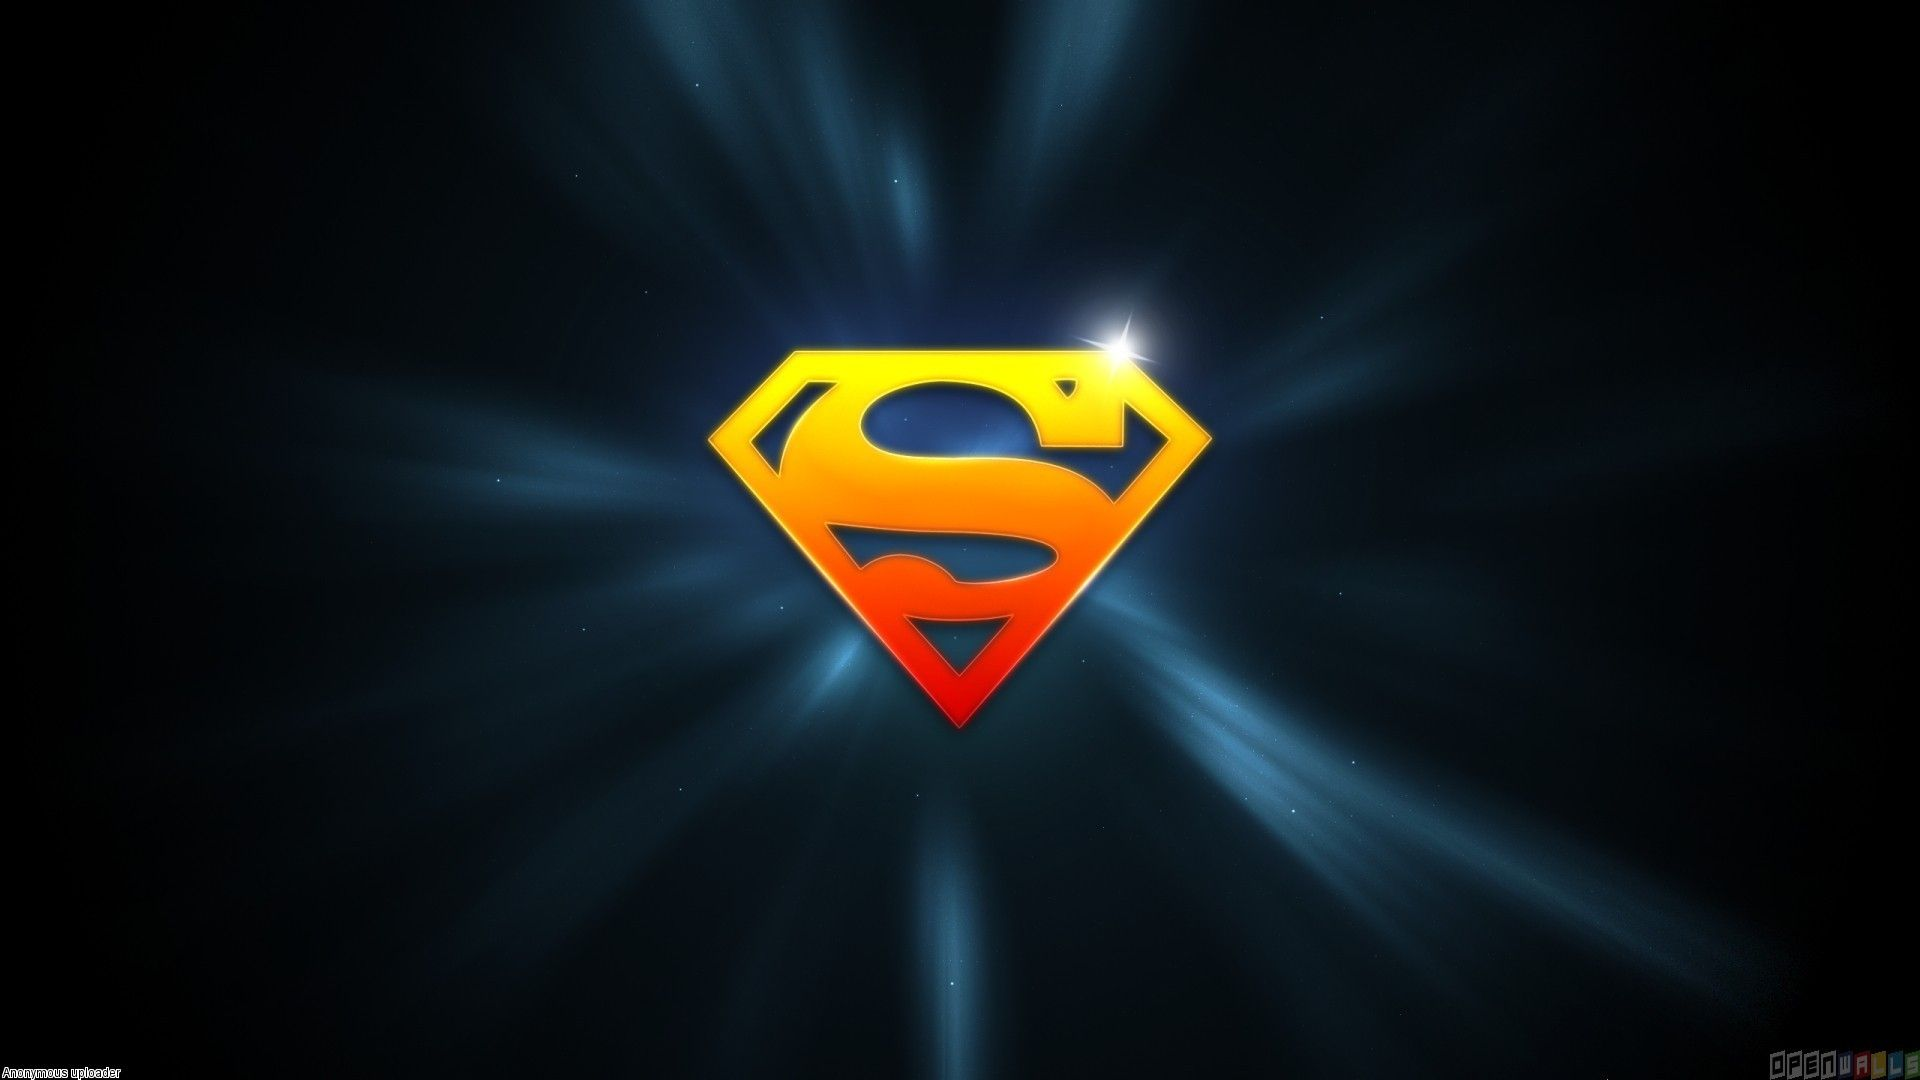 Cool wallpaper hd superman logo wallpapers pinterest superman cool wallpaper hd superman logo buycottarizona Gallery